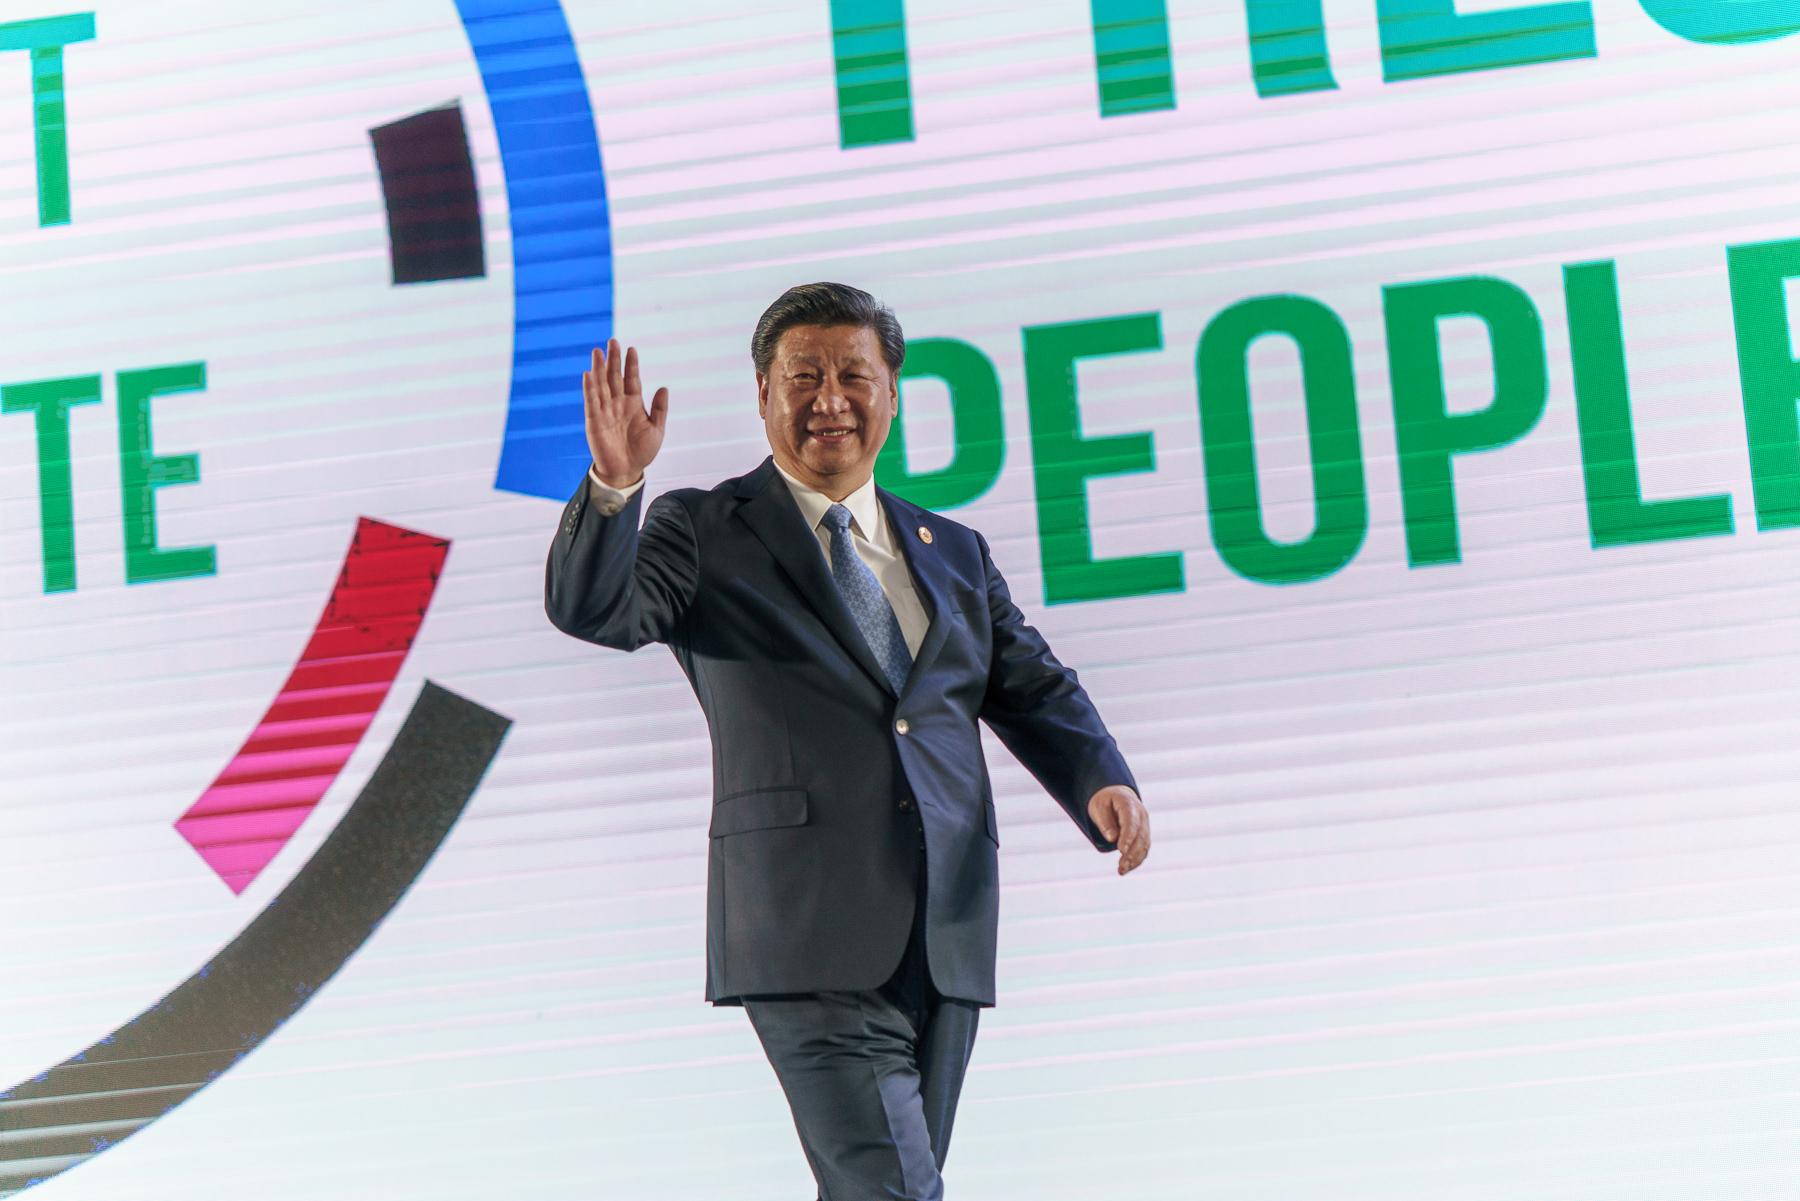 President Xi Jinping of China, November 2015.